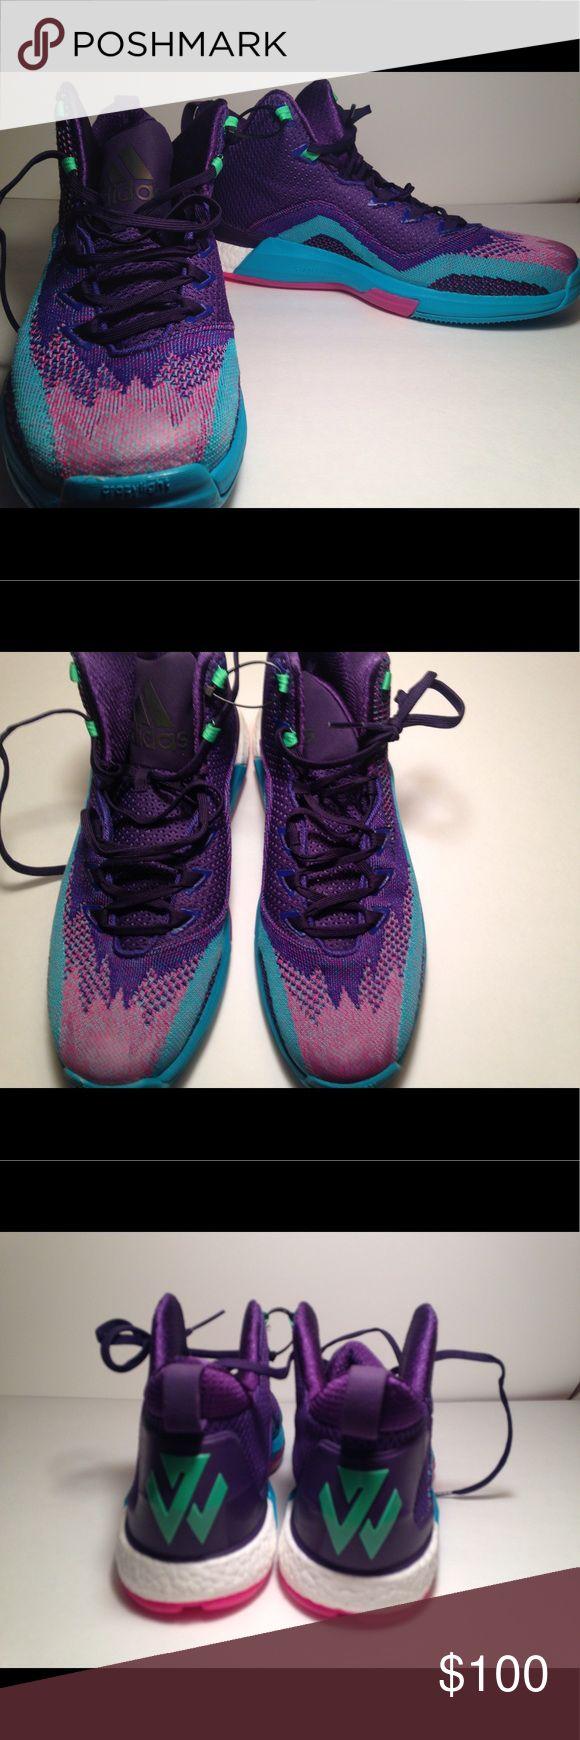 Adidas John Wall Boost 2 NWOT never worn John Wall Boost by Adidas adidas Shoes Athletic Shoes